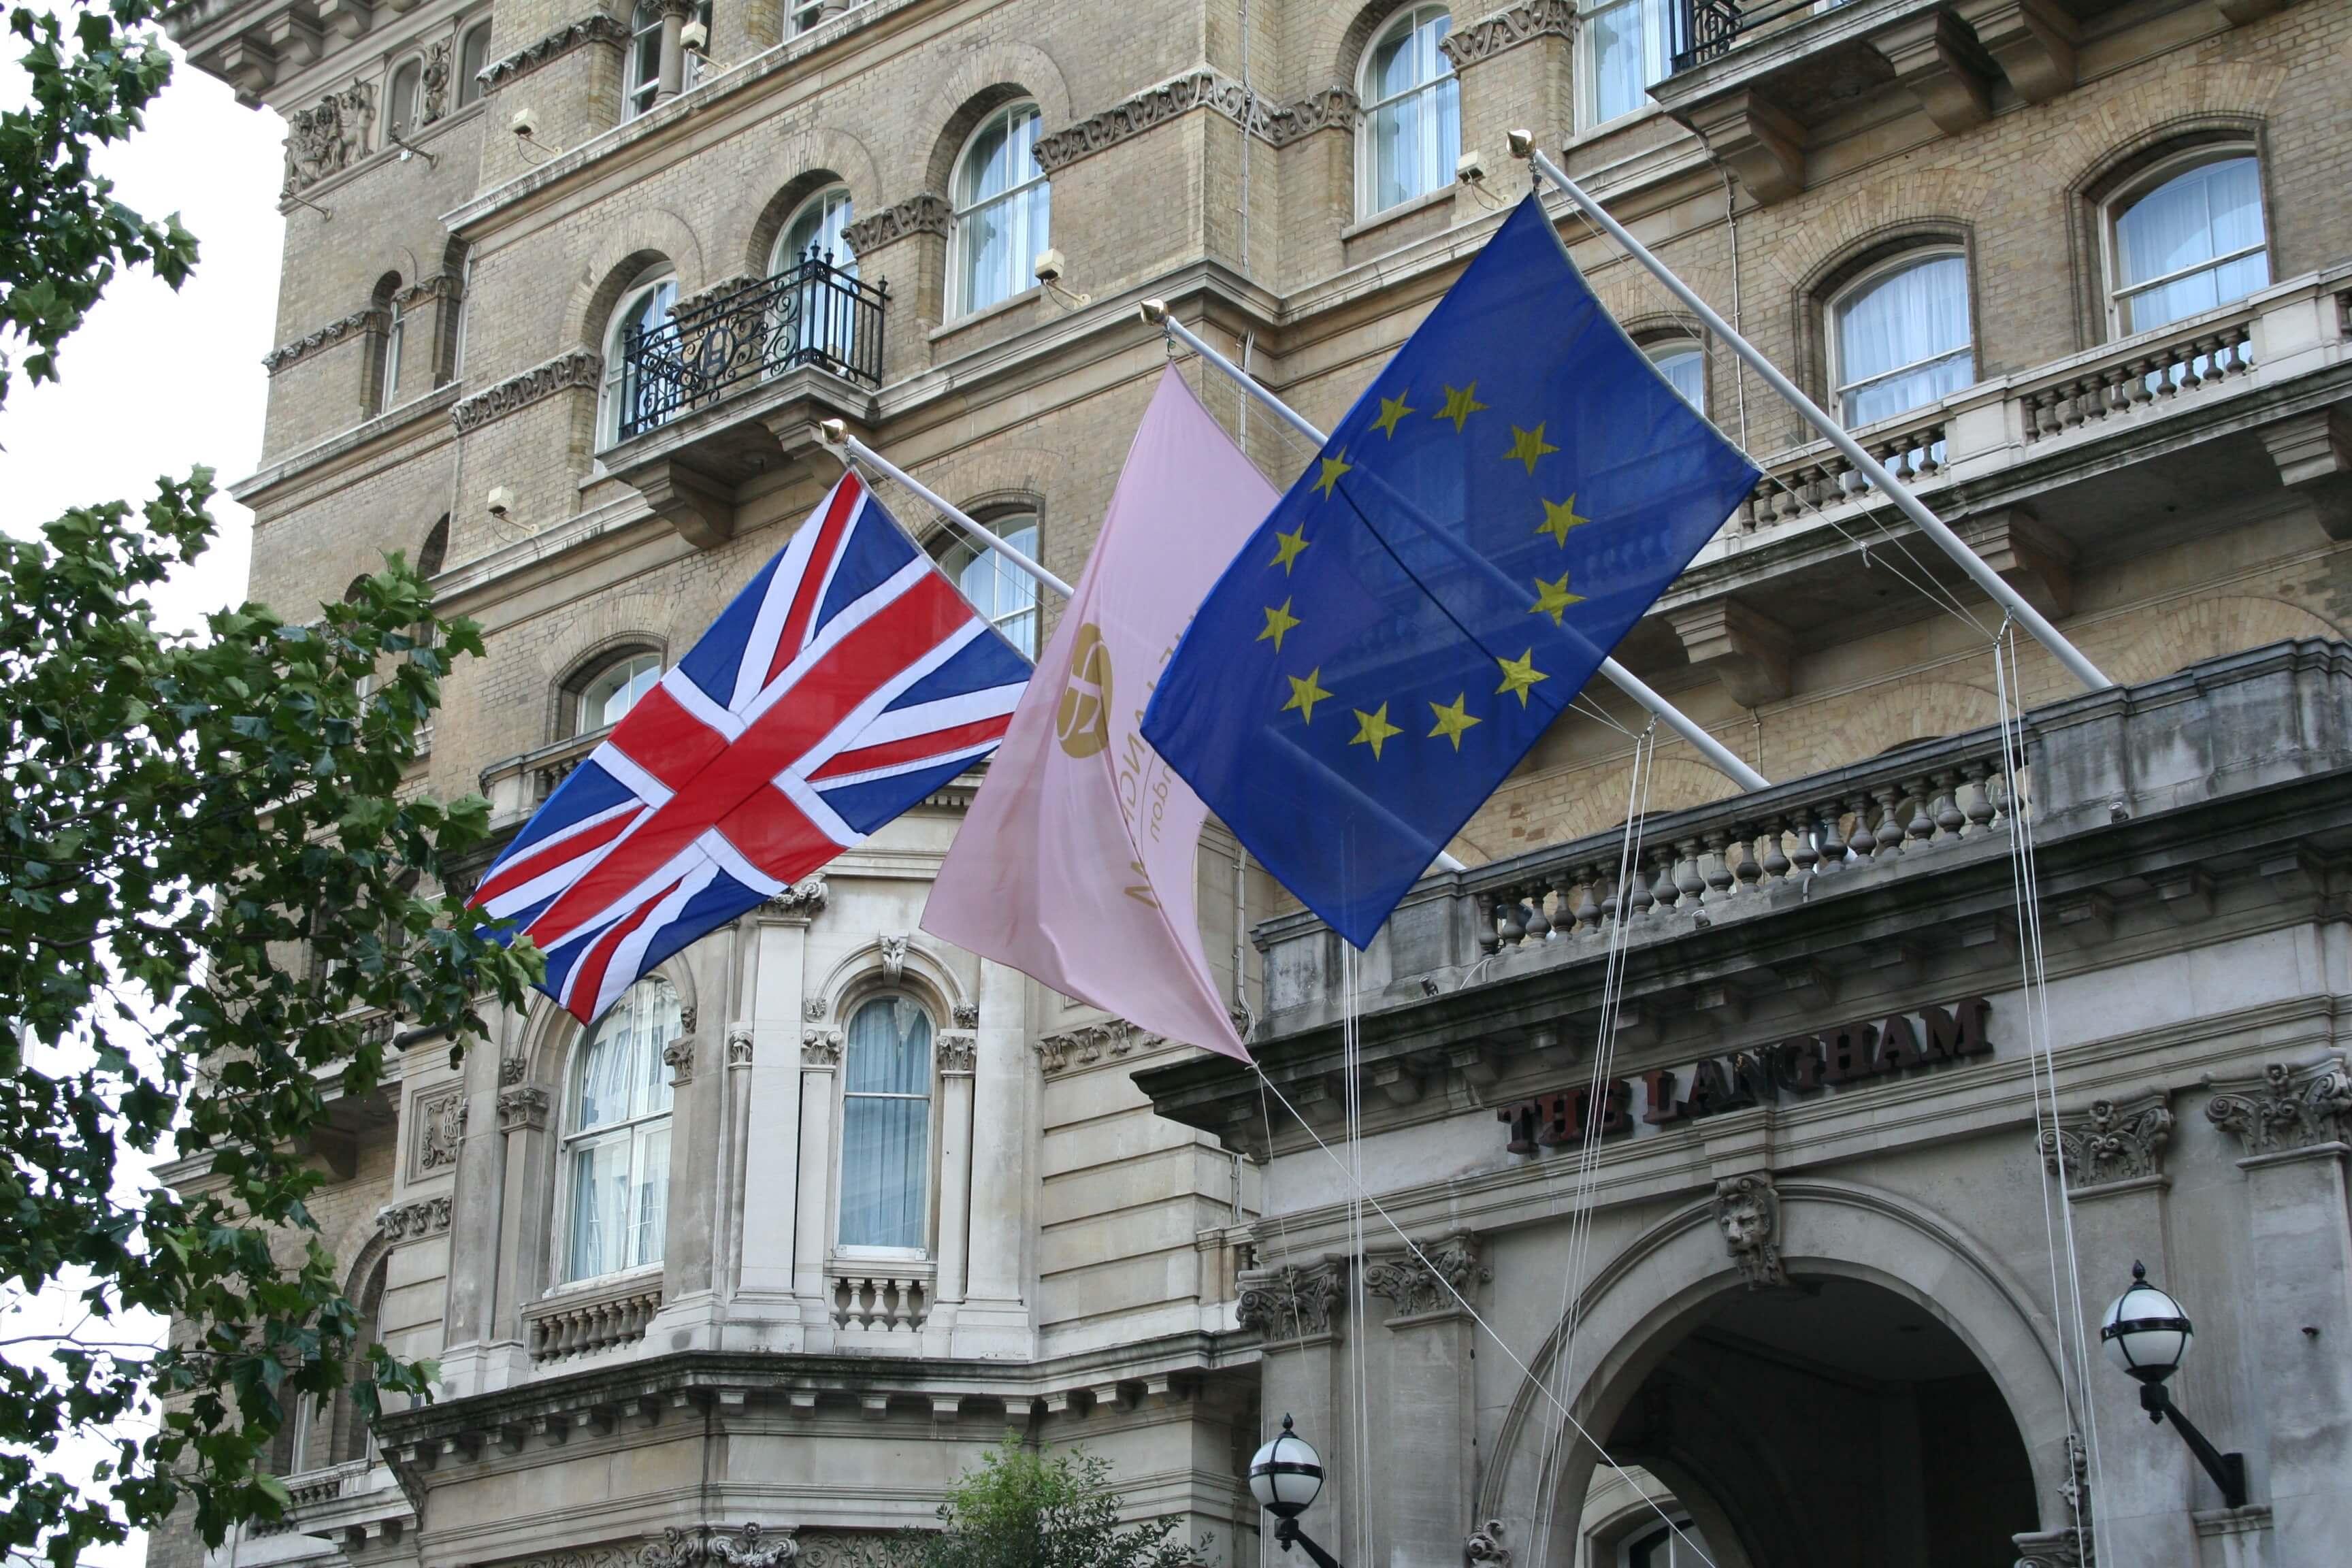 European hotels: Revenues up, profits down